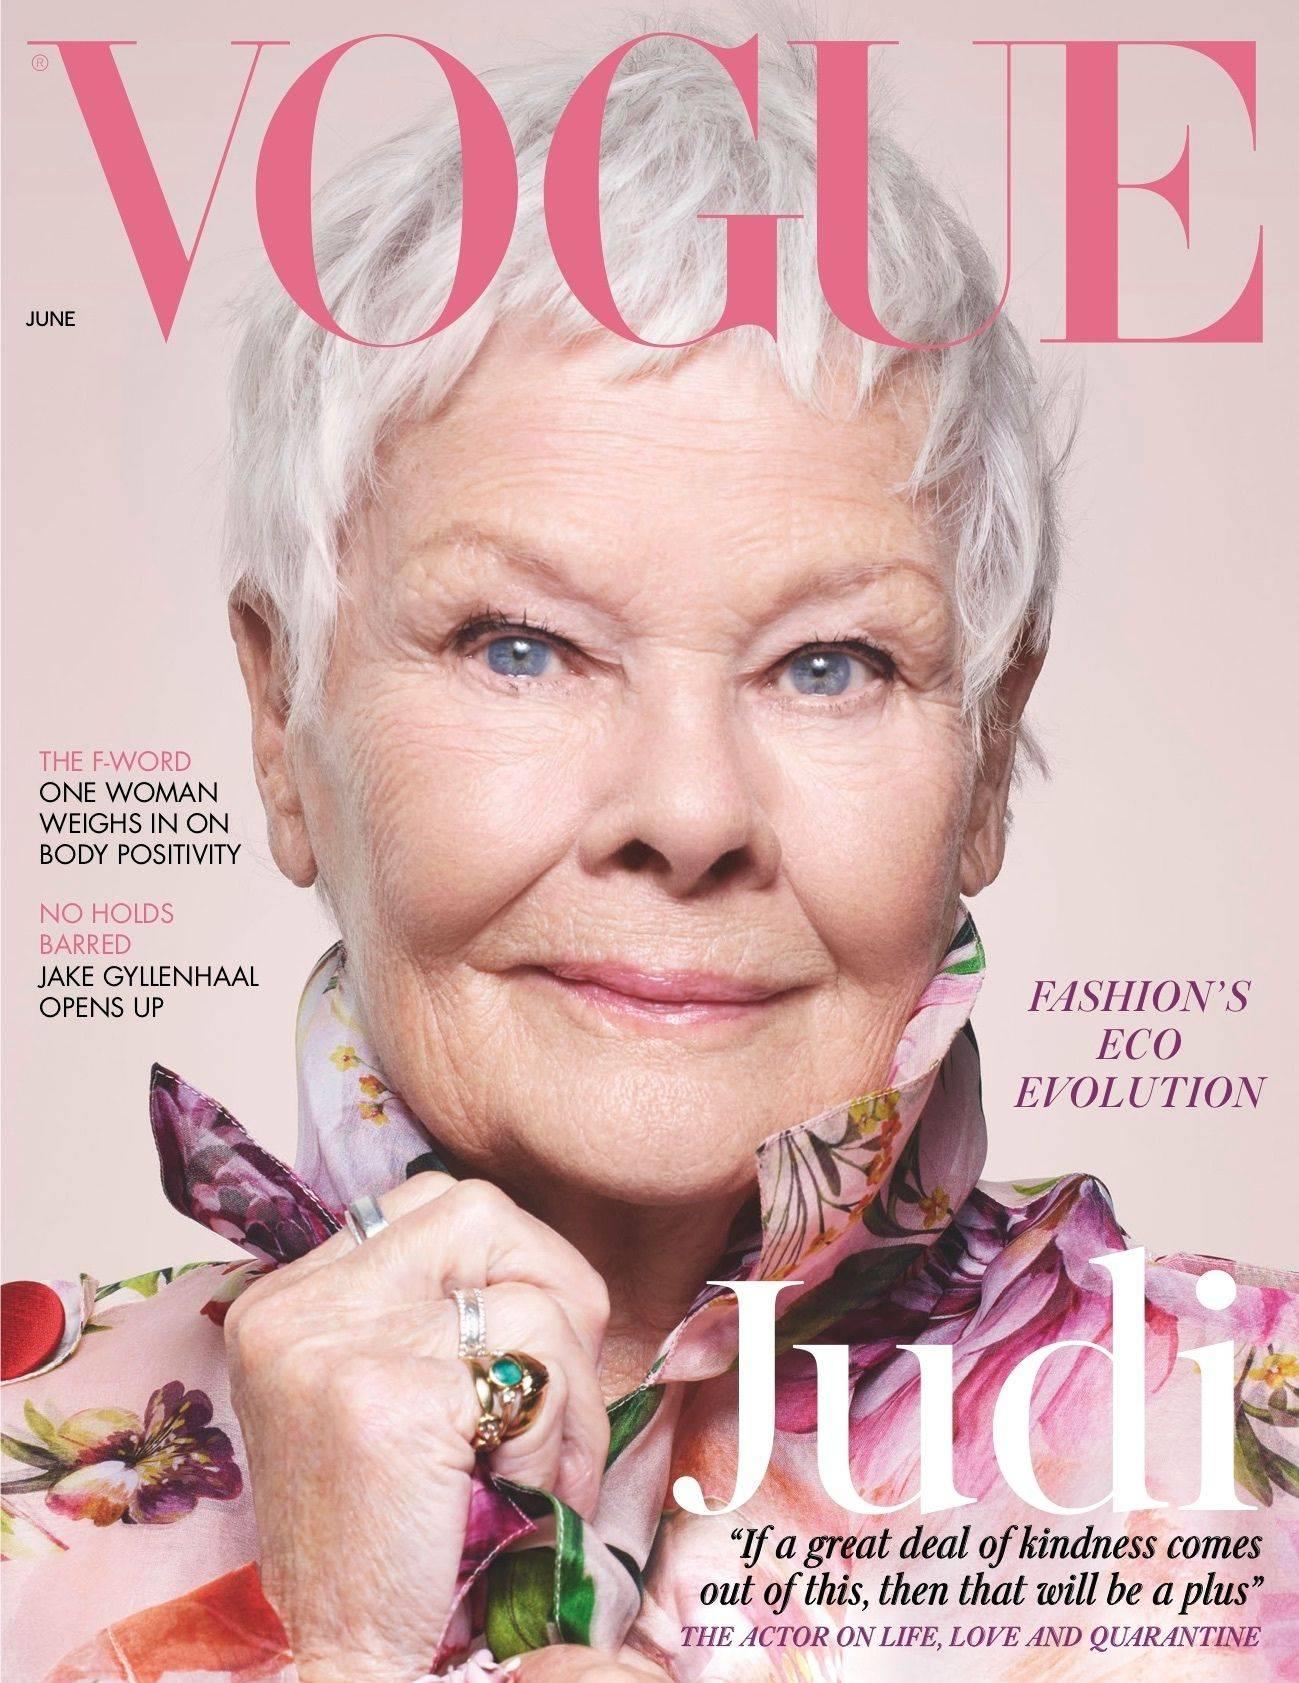 vogue-magazine-british-beauty-products-june-2020